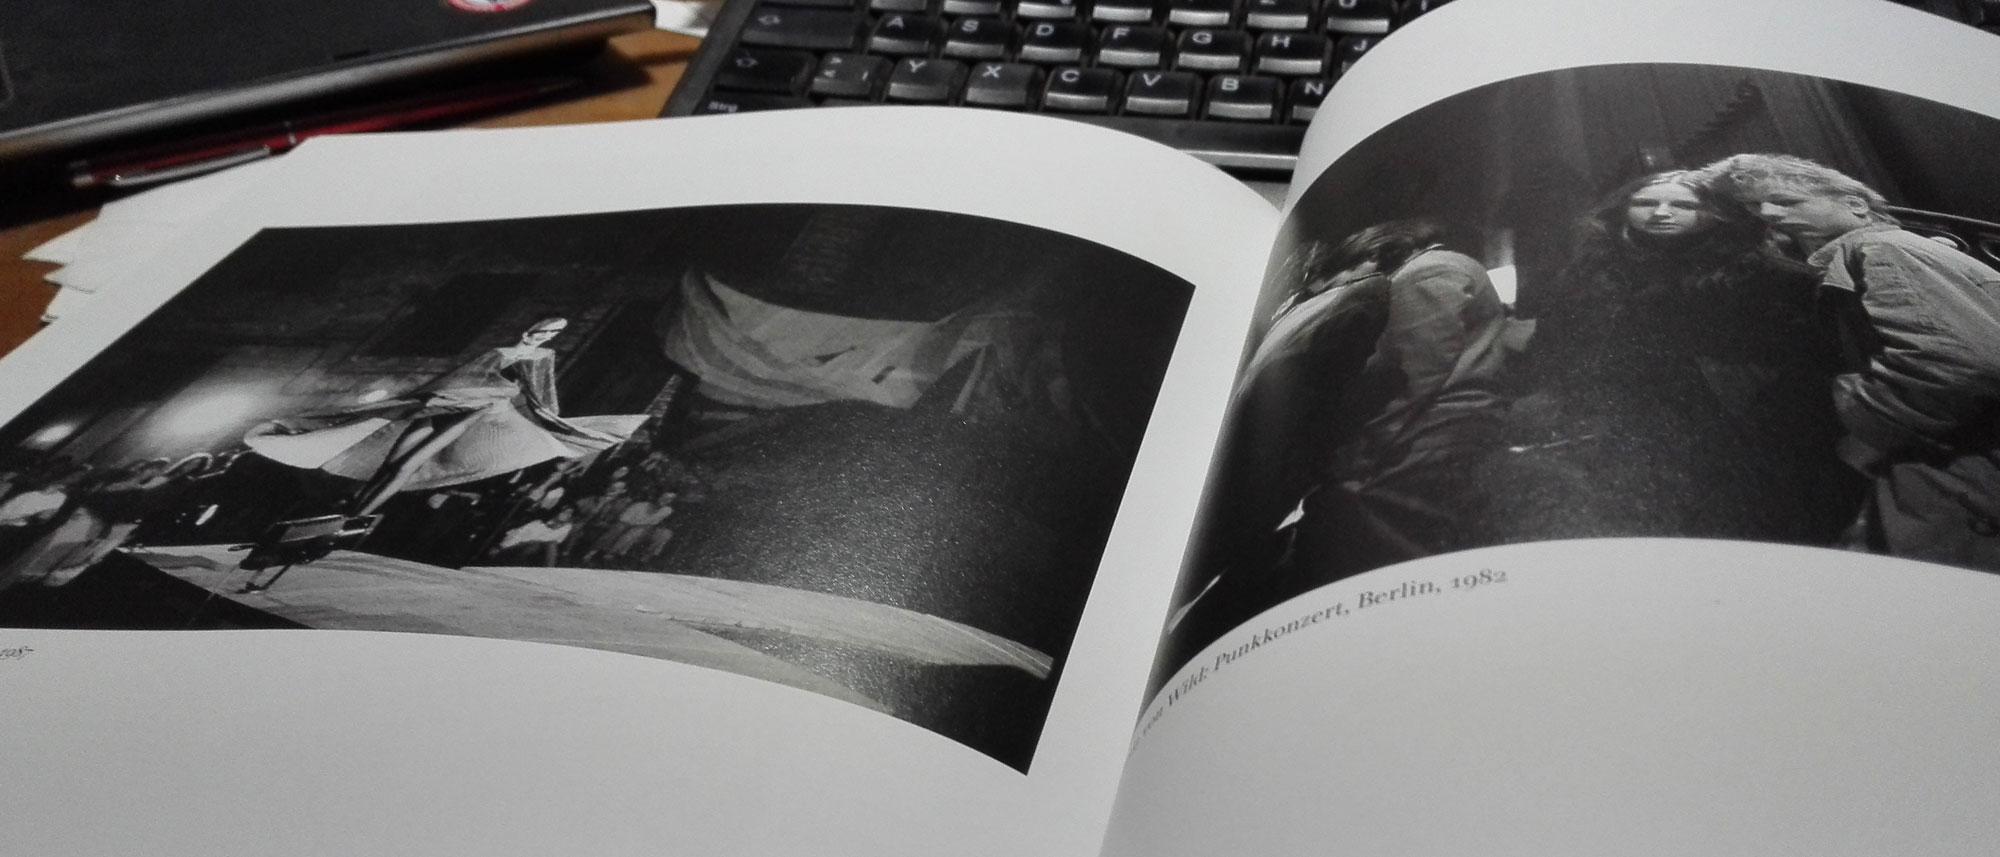 lehmstedt das pure leben ddr fotoband